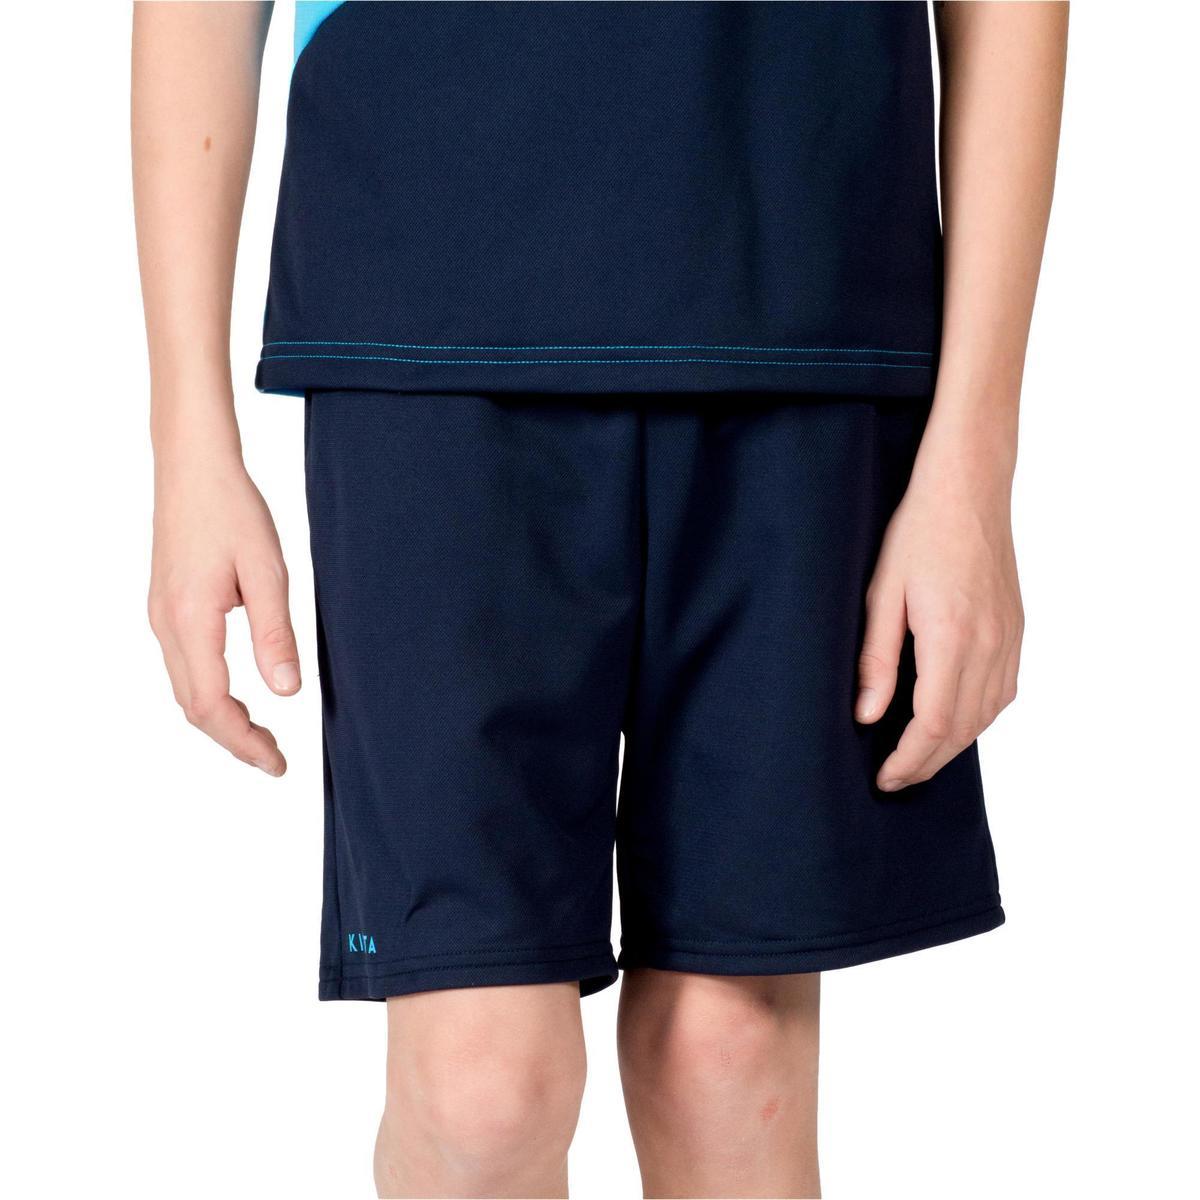 Bild 3 von Feldhockey-Shorts FH100 Kinder hellblau/dunkelblau